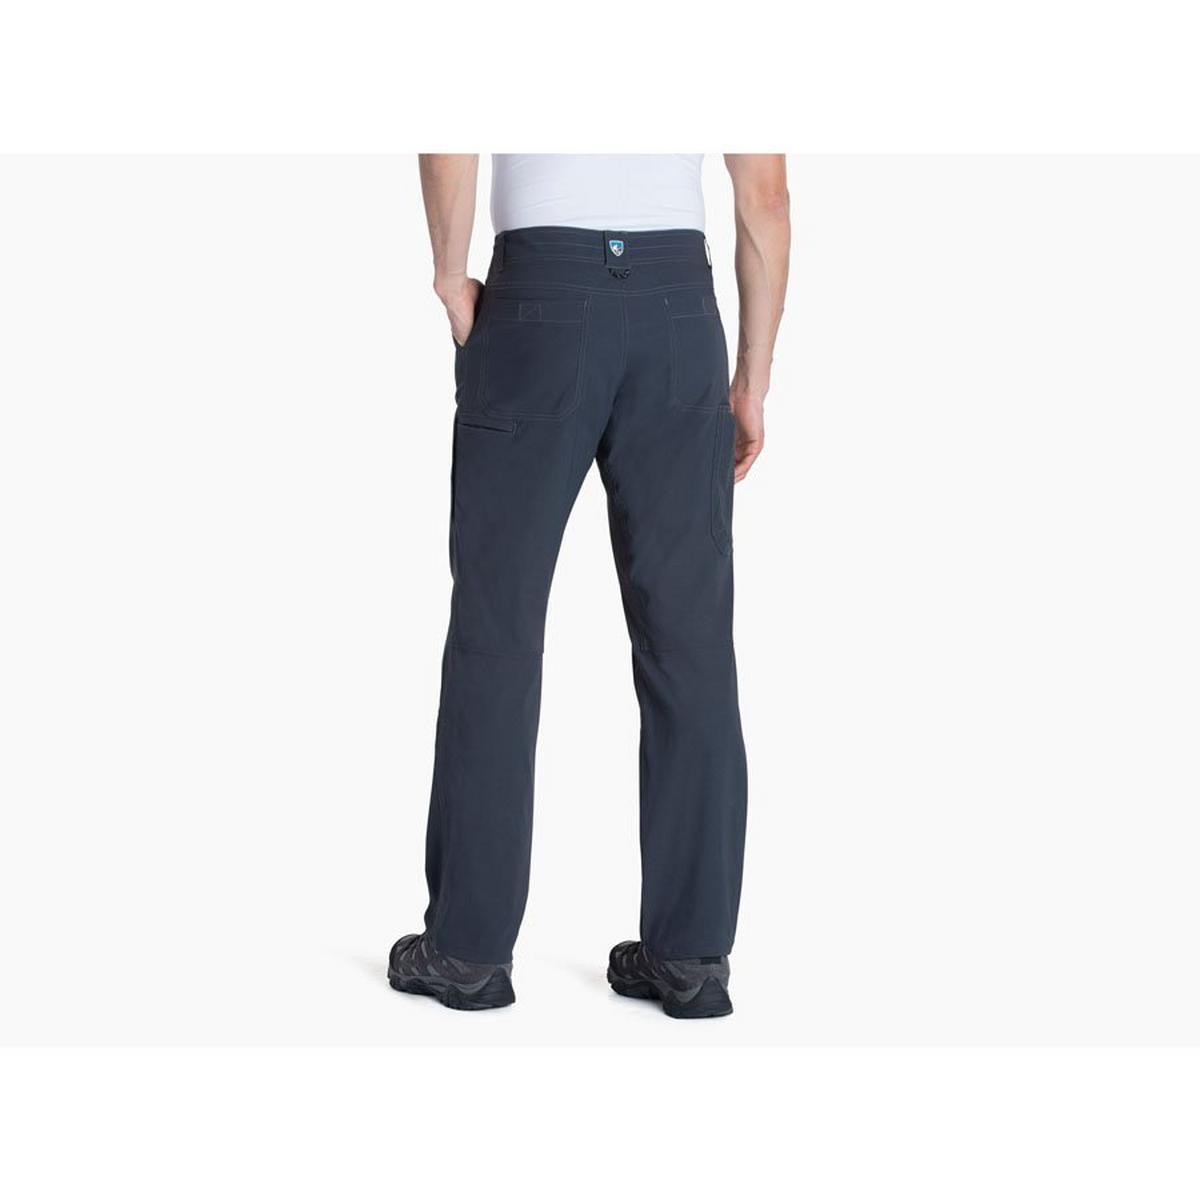 Kuhl Pant Men's Renegade SHORT Leg Trousers Koal